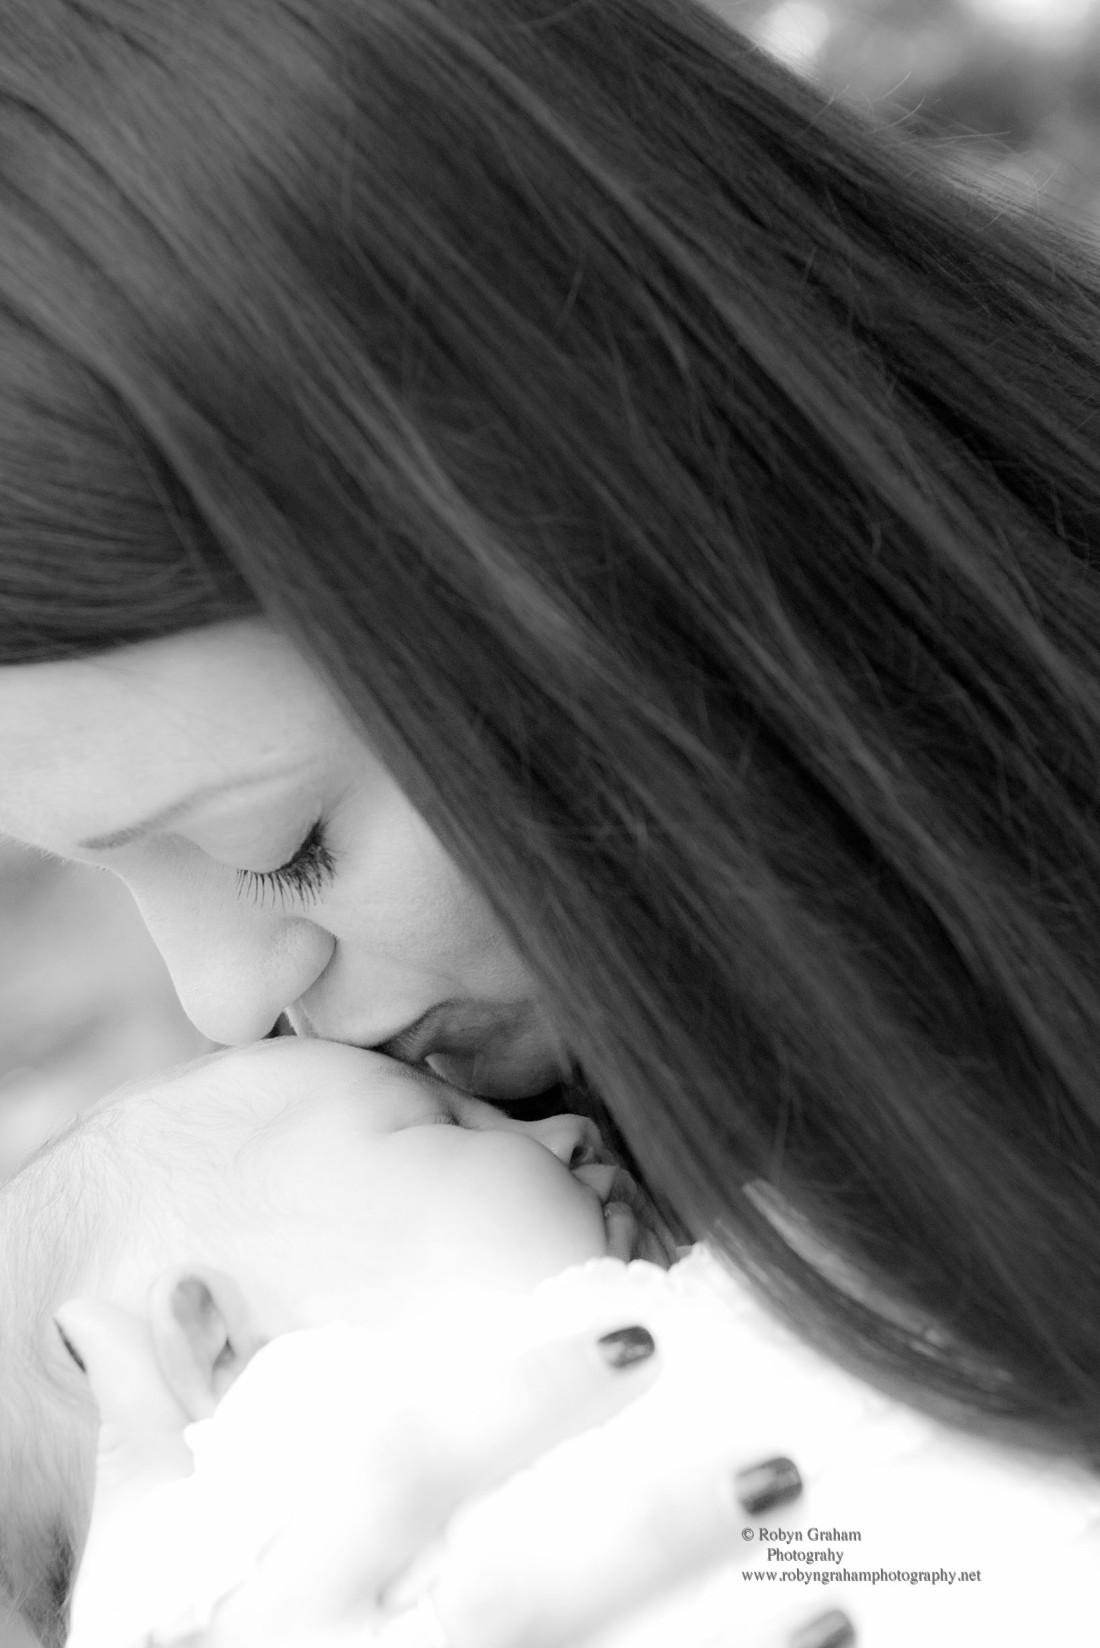 Love of Loves ss 1/125  f 6.3  ISO 500